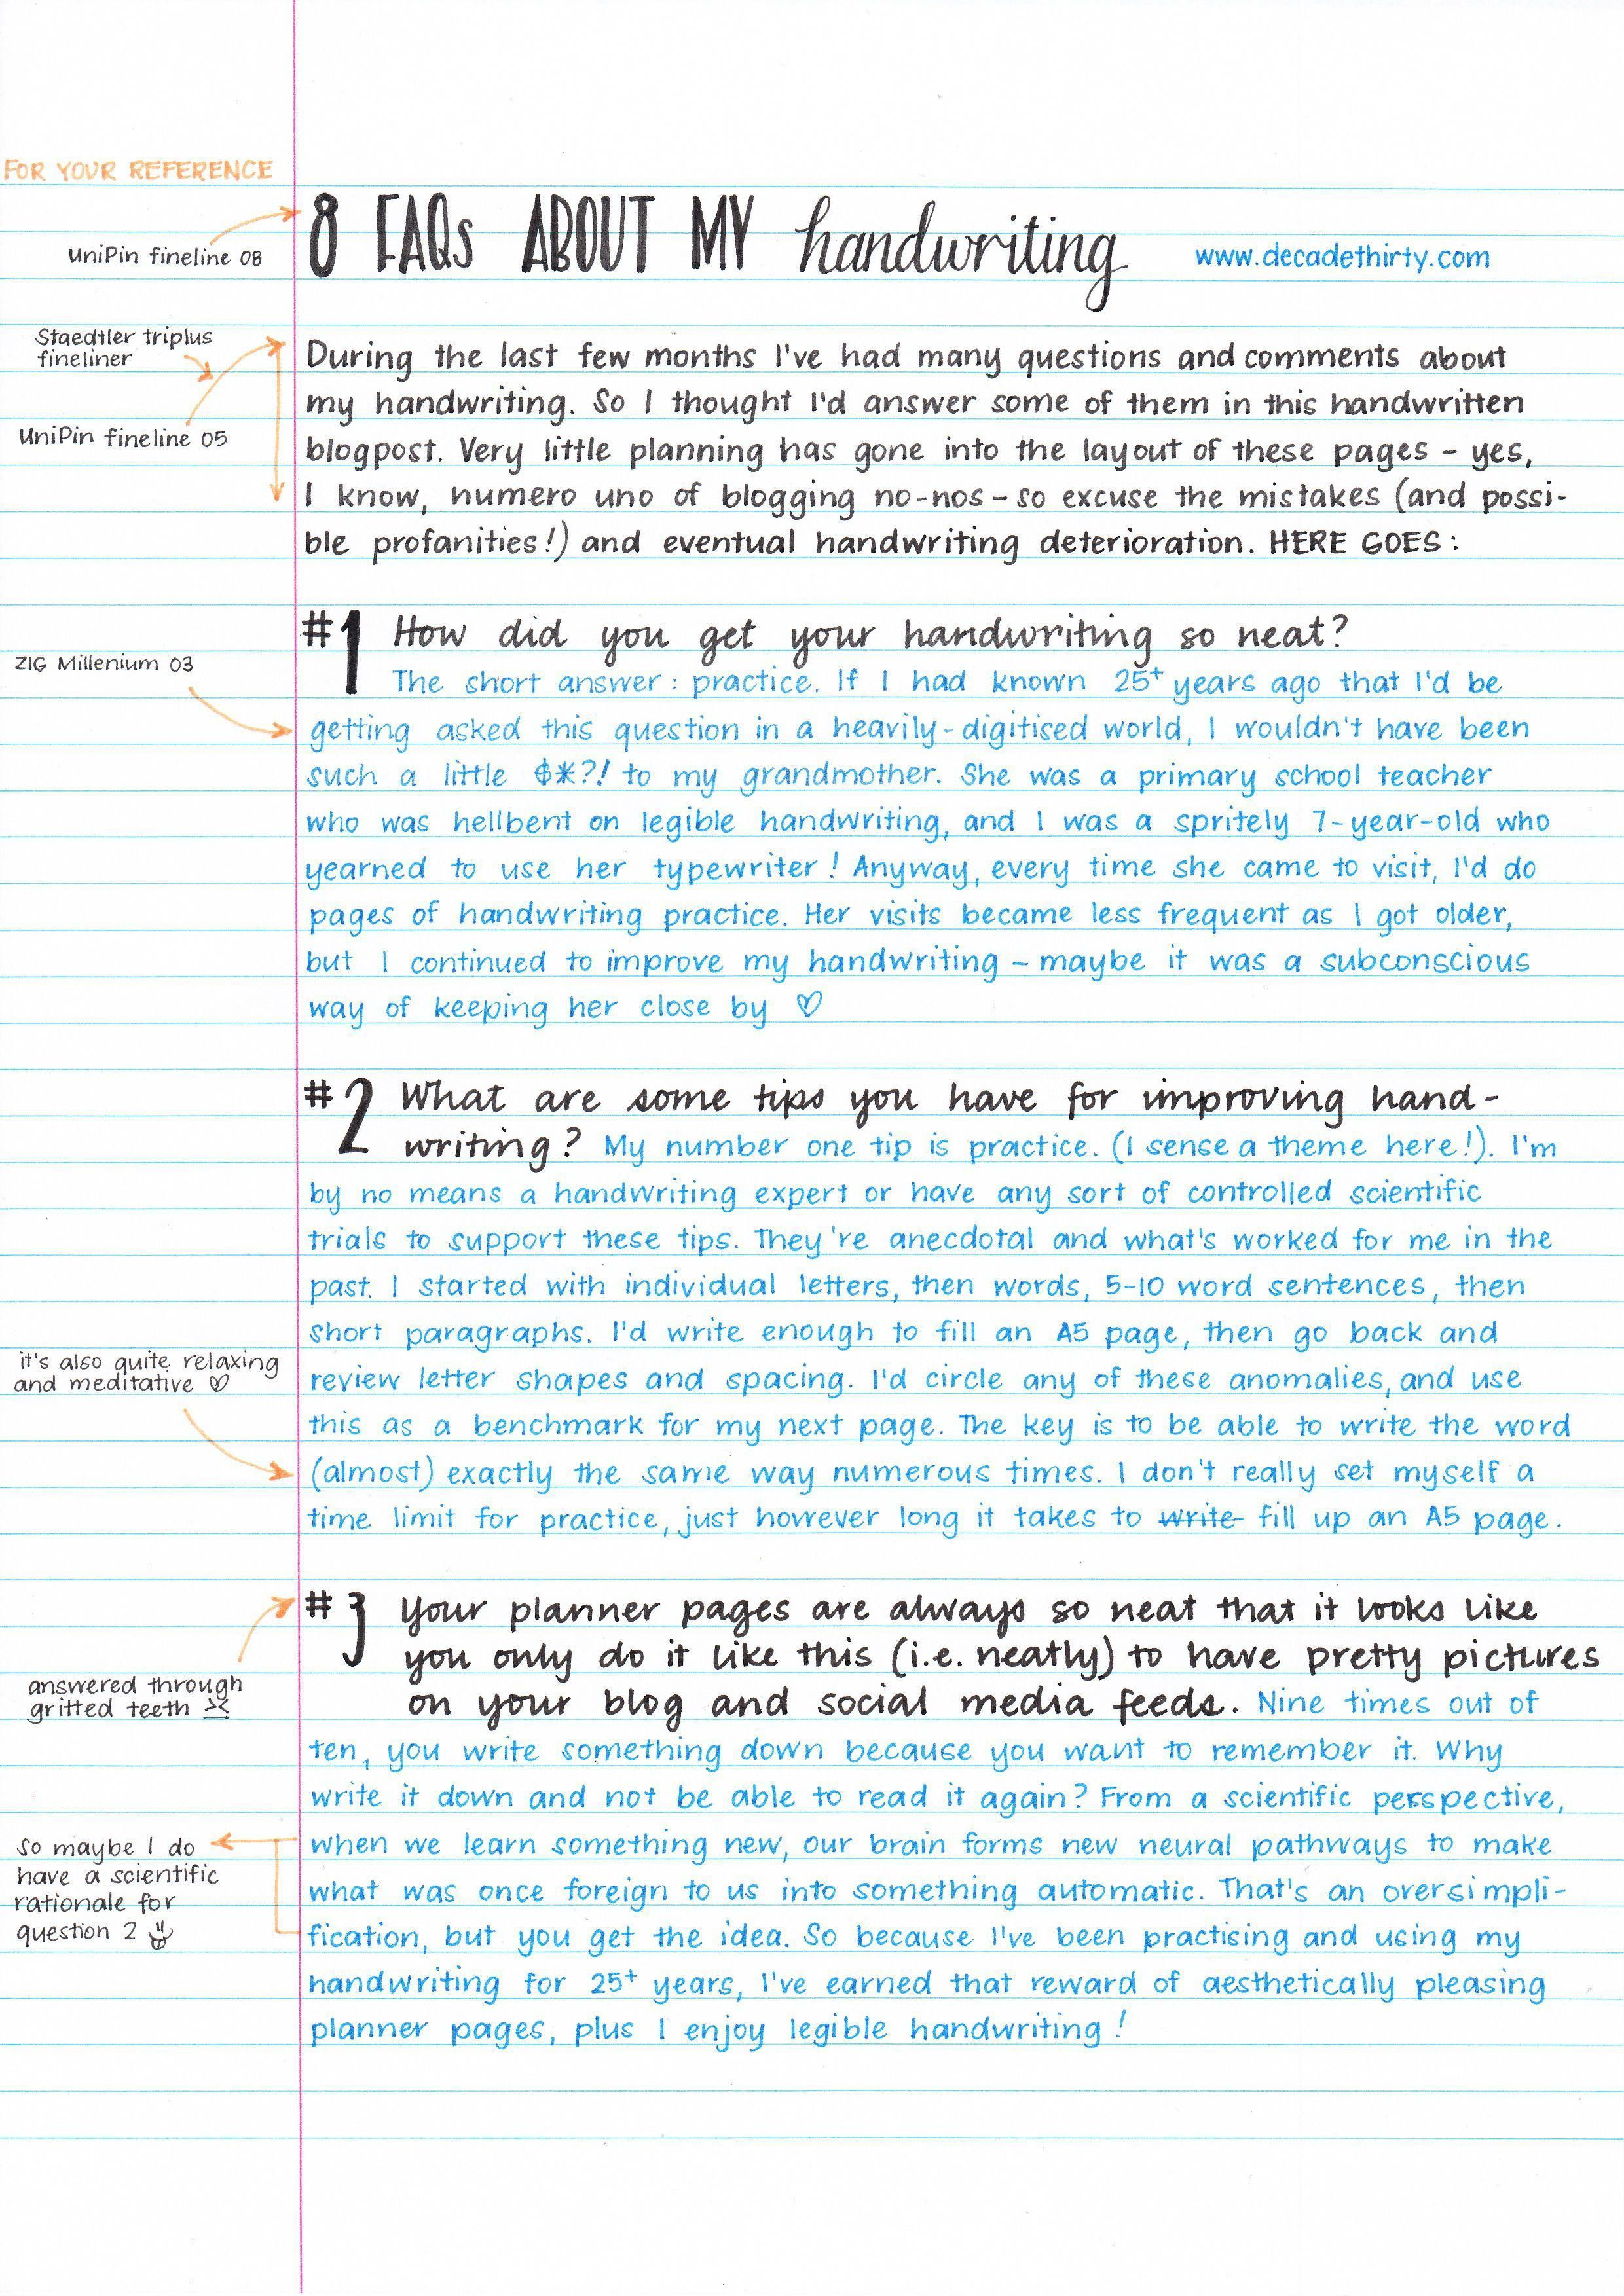 Handwriting Tips Handwritingtipsfortoday Handwriting Practice Handwriting Practice Sheets Handwriting Practice Worksheets [ 3507 x 2480 Pixel ]